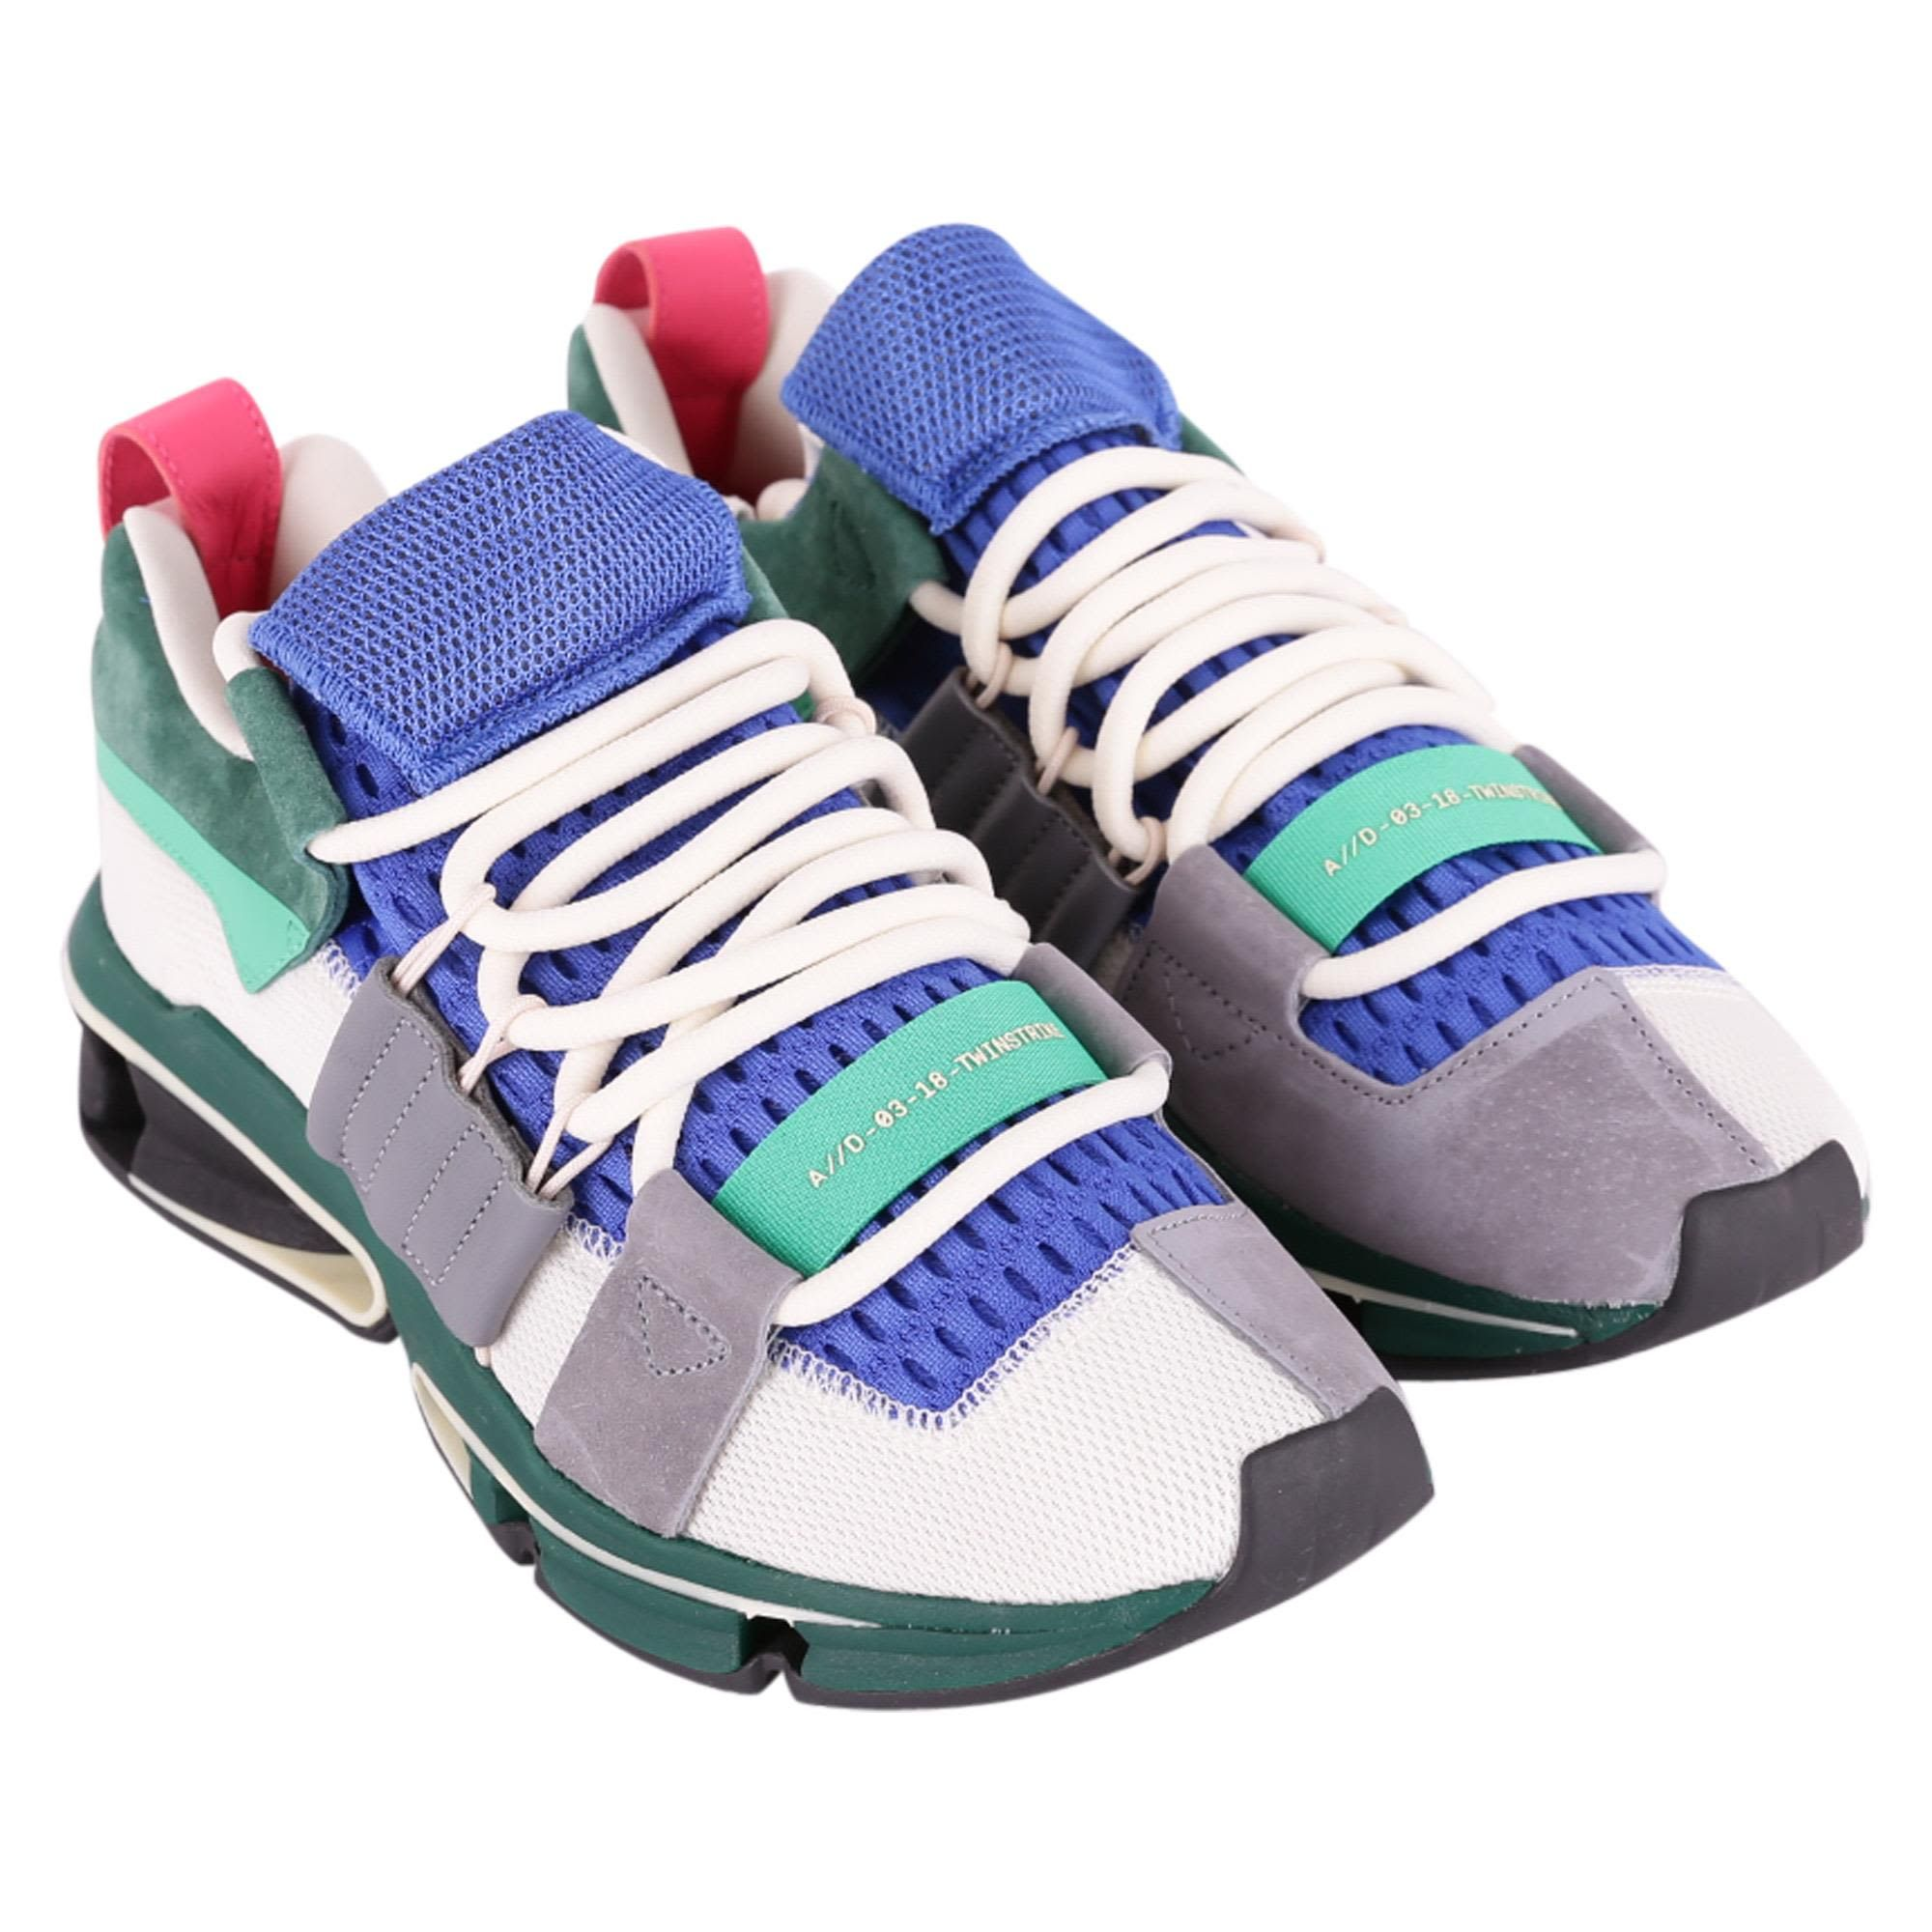 ADIDAS TWINSTRIKE ADV 18000 @sneakers76 in store online H